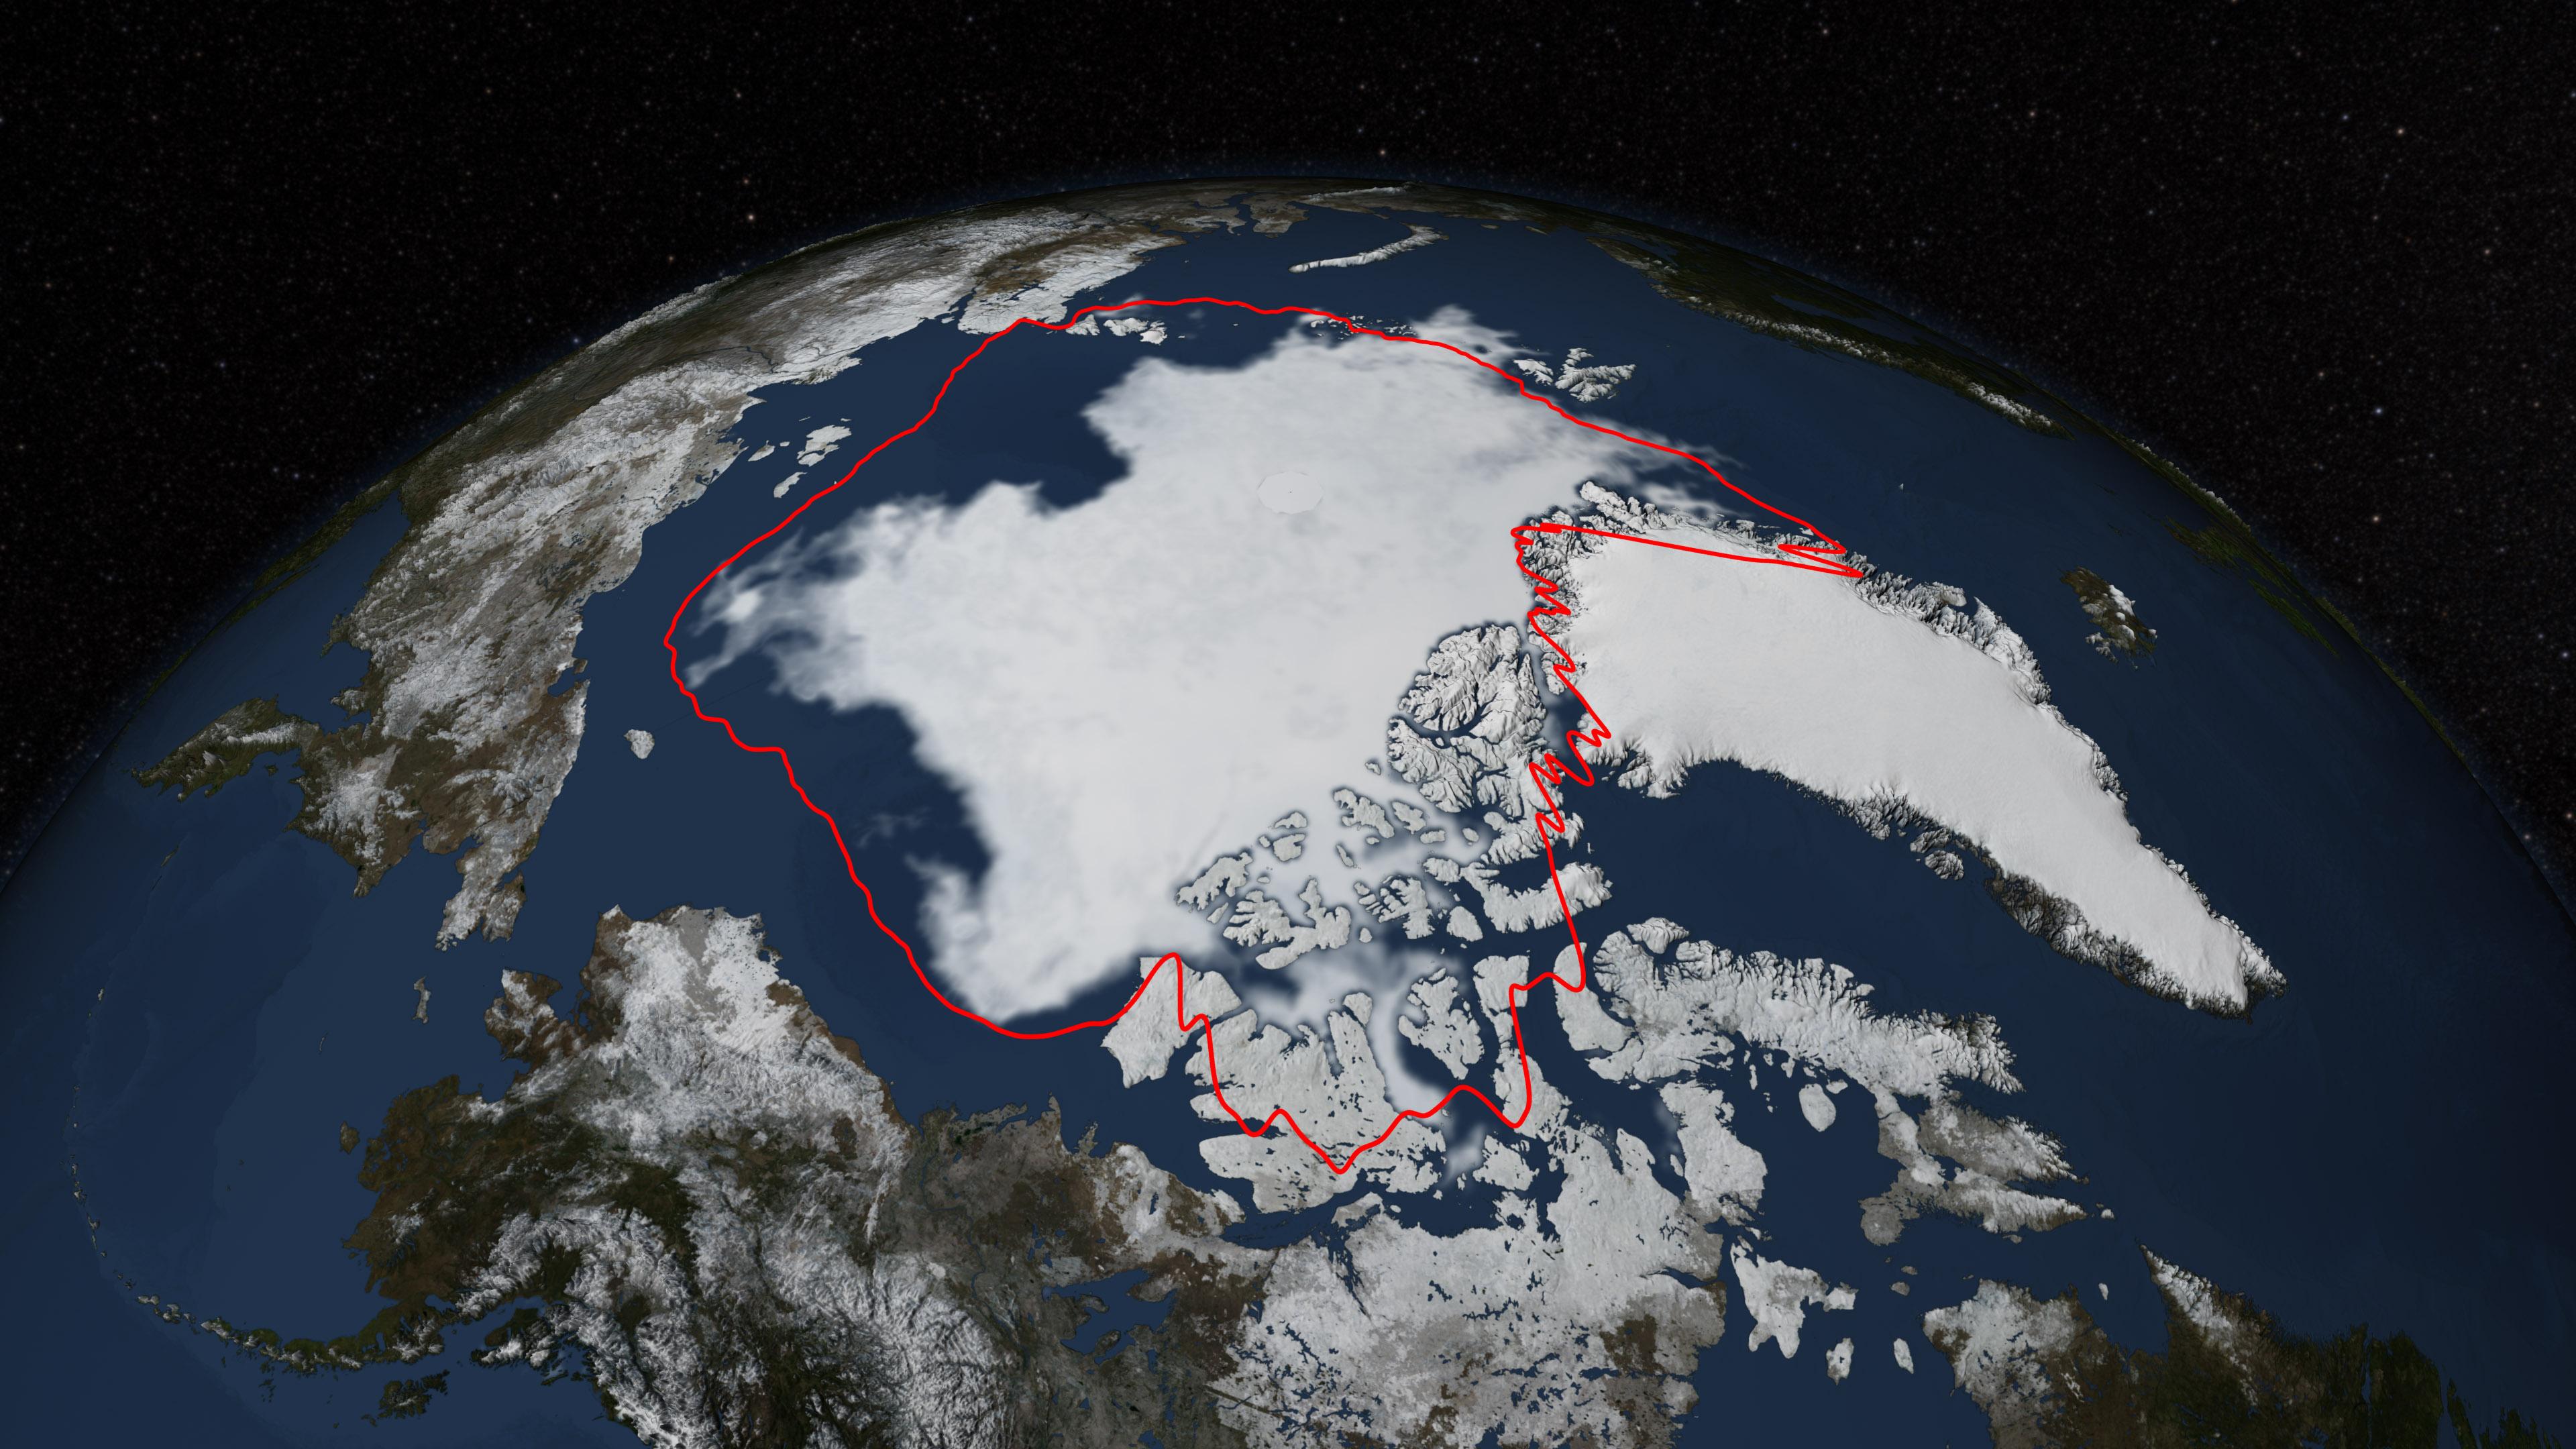 nasa scientist climate change - HD1920×1080